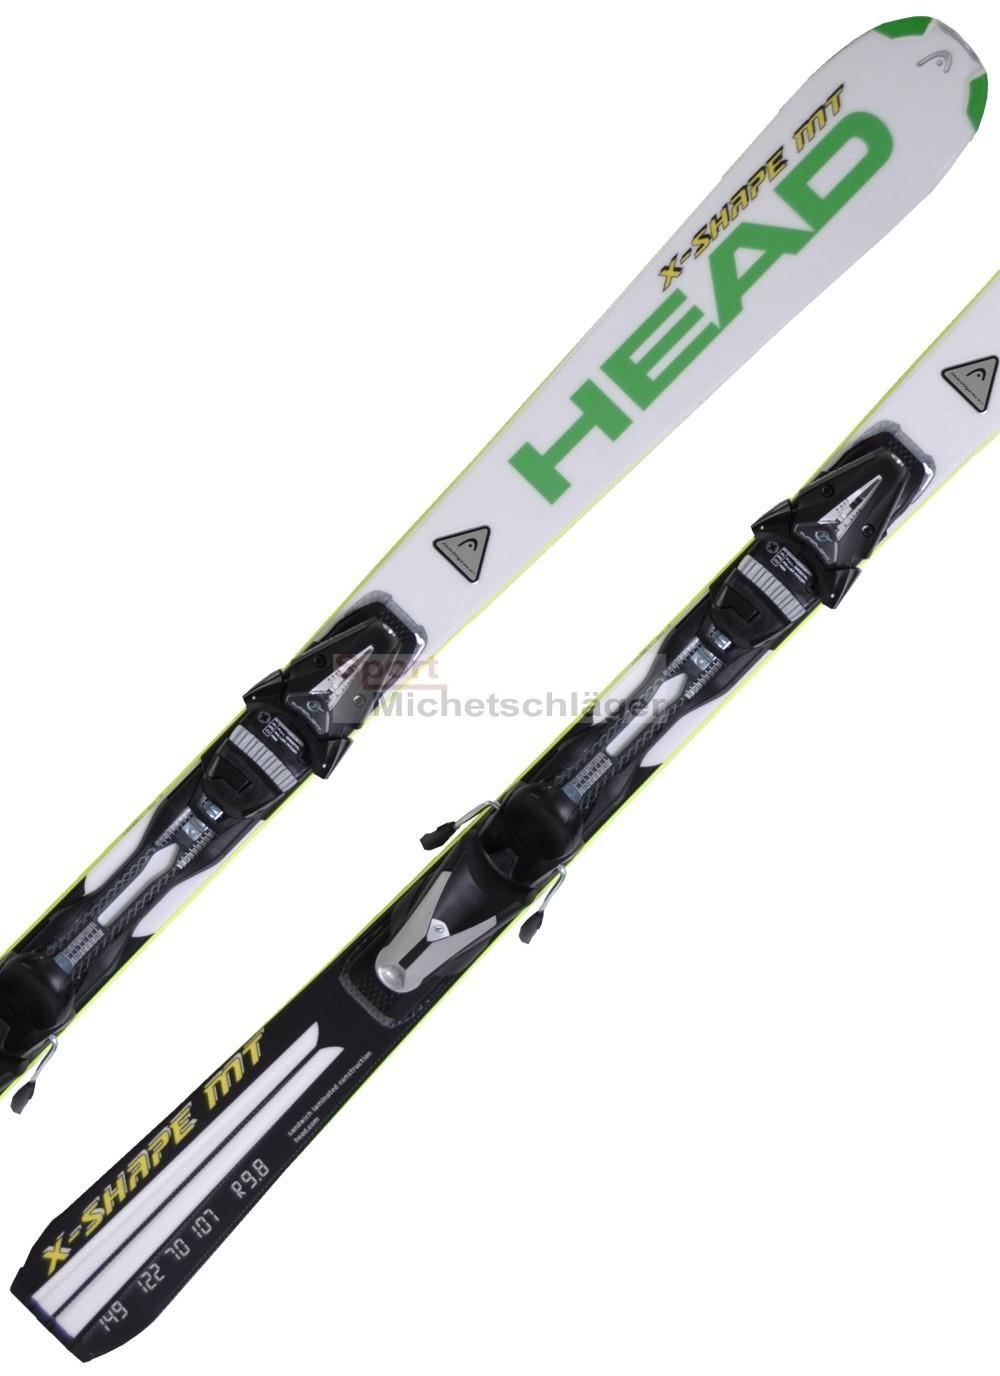 [sport sofort online] Head Ski X-Shape MT mit Bindung Tyrolia Power 11 black/yellow 166/170/177cm - mit Amazon & Paypal zahlbar